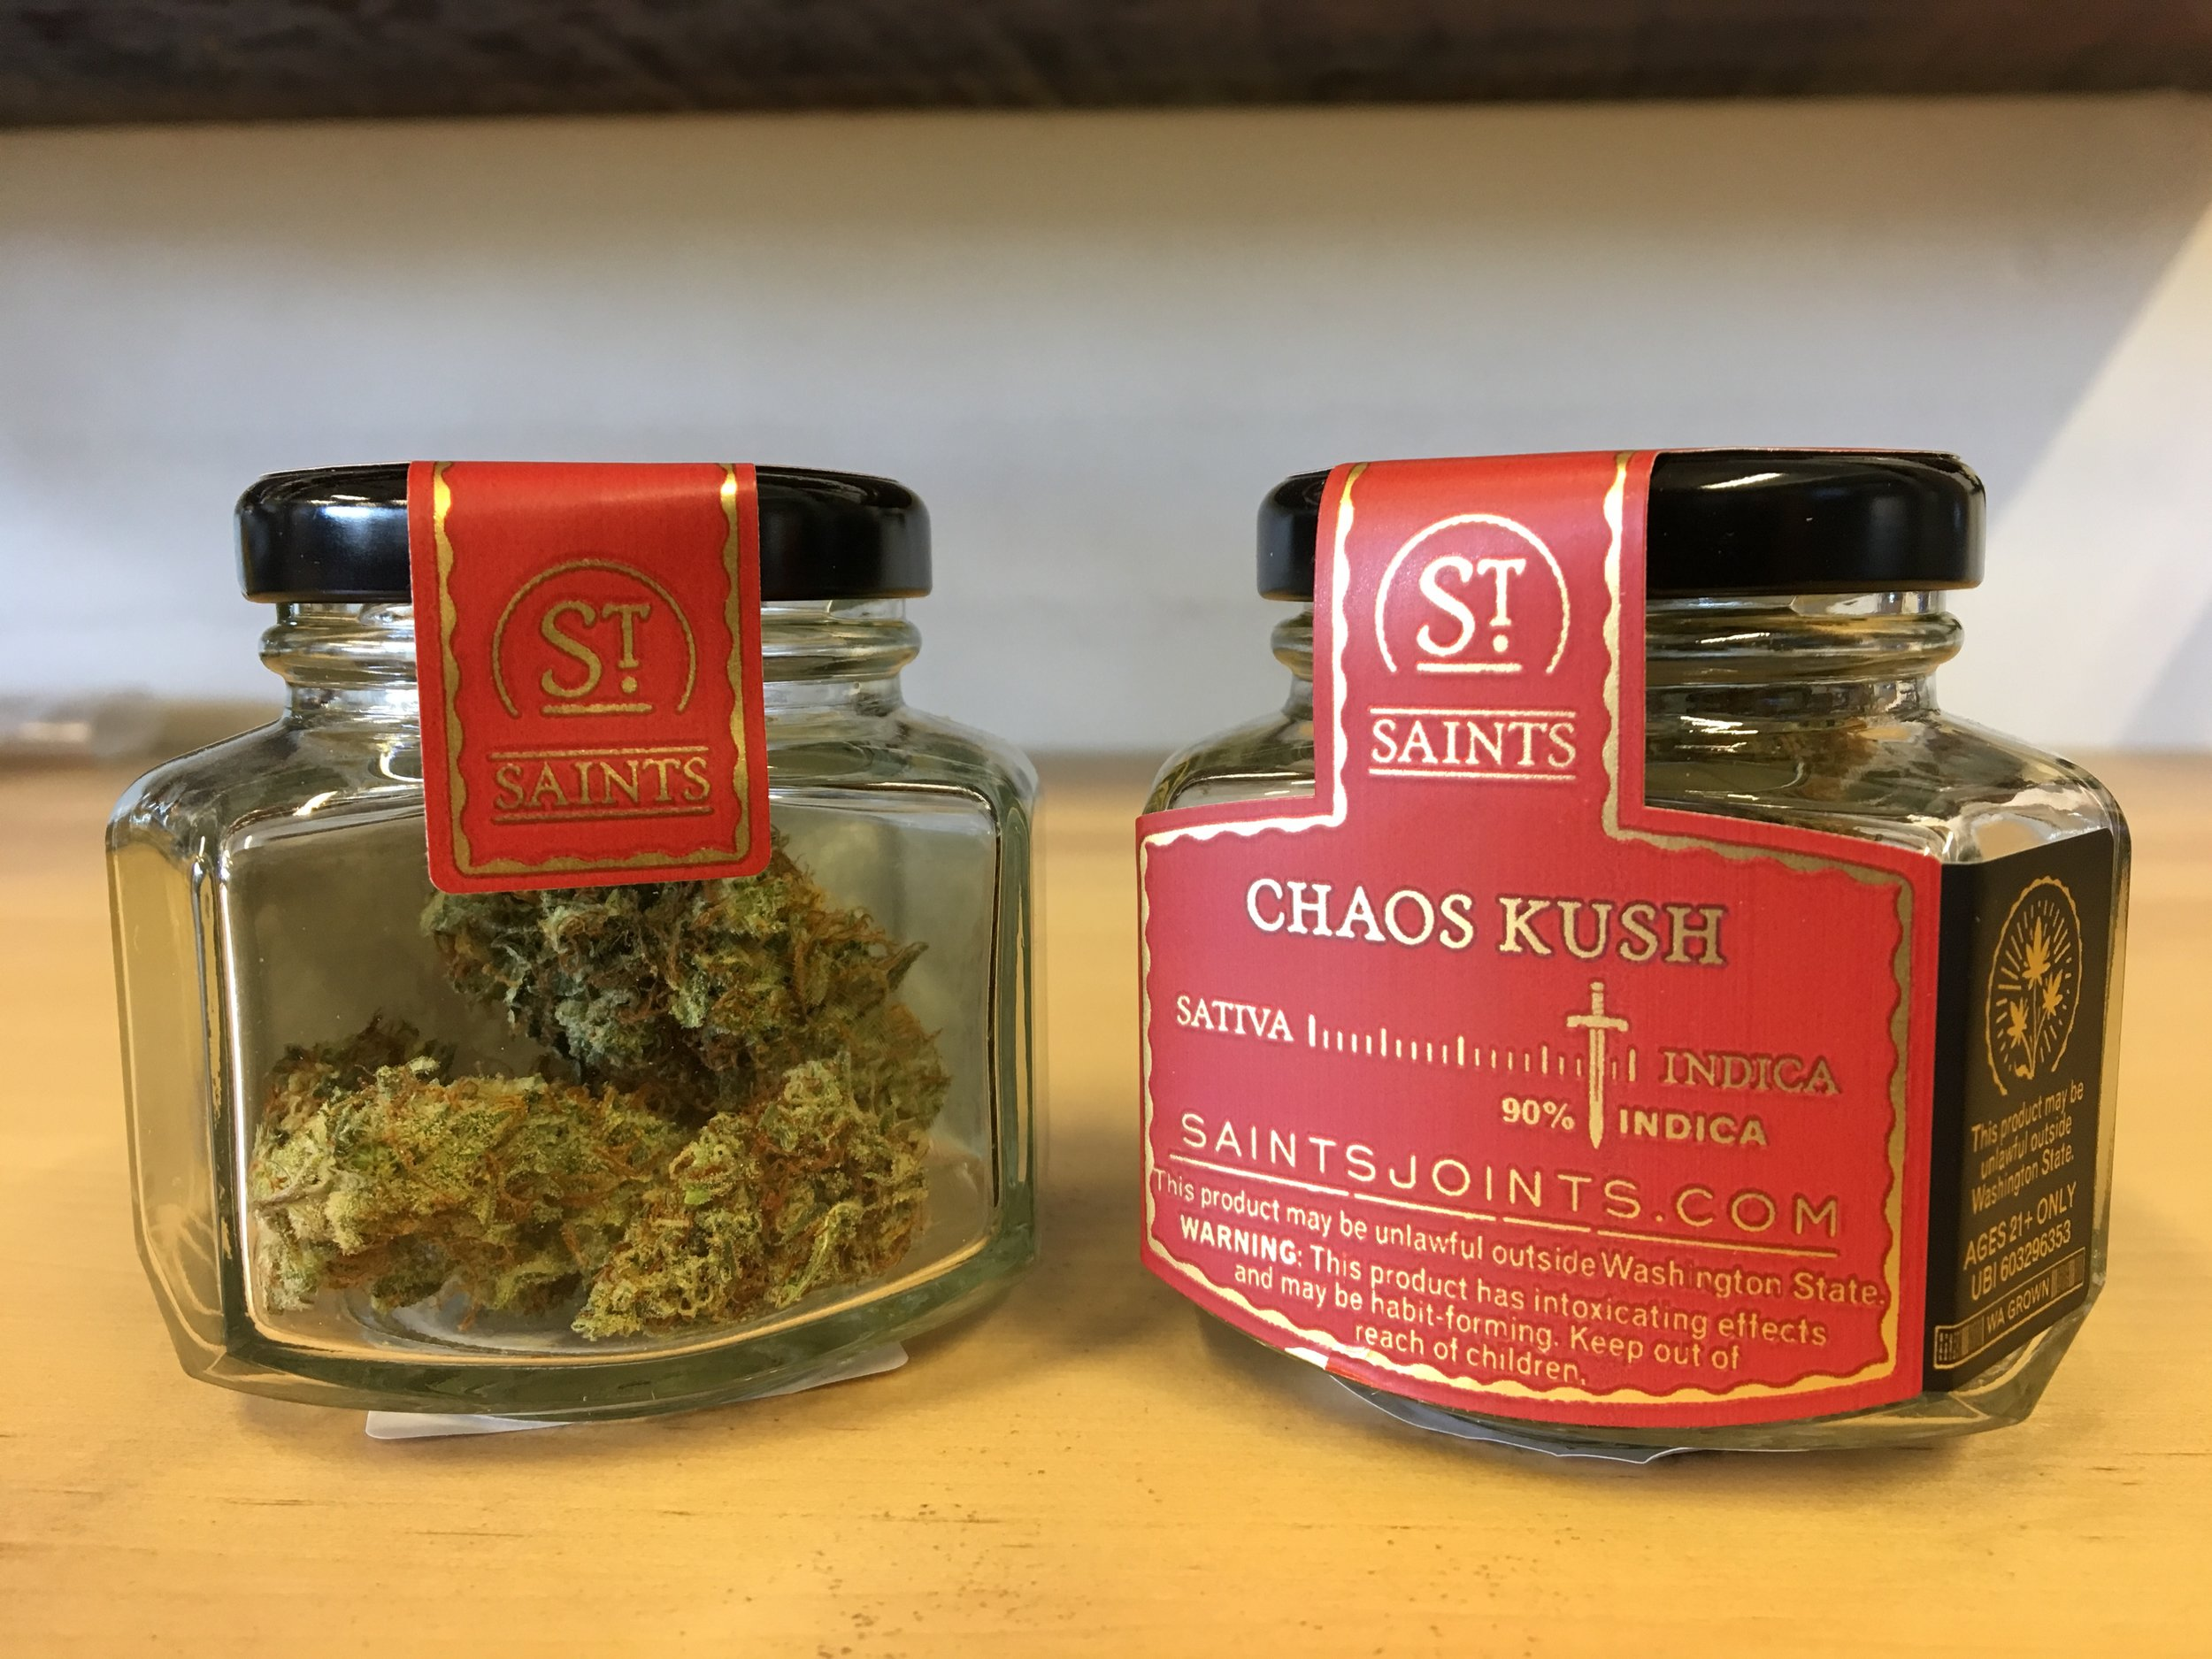 Chaos Kush By Seattle Green Bud based in Georgetown, Washington